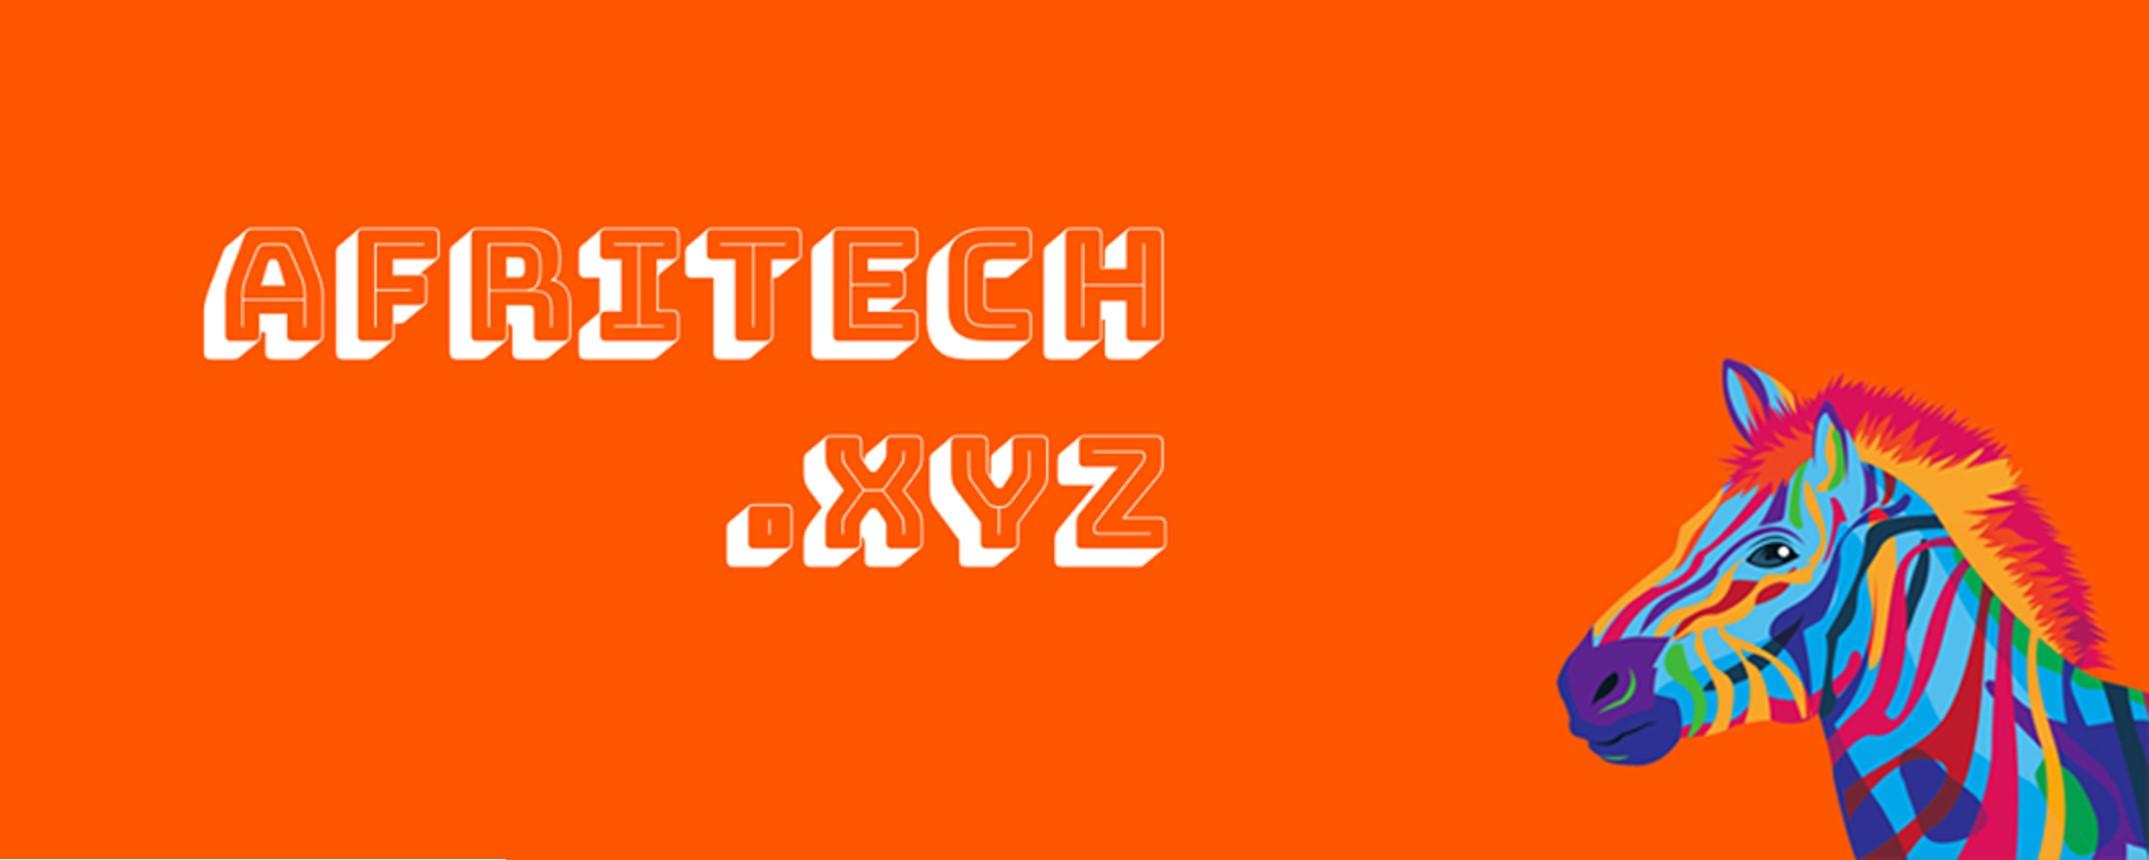 AfriTech XYZ - African Tech Startups Mentors Movemeback African initiative cover image